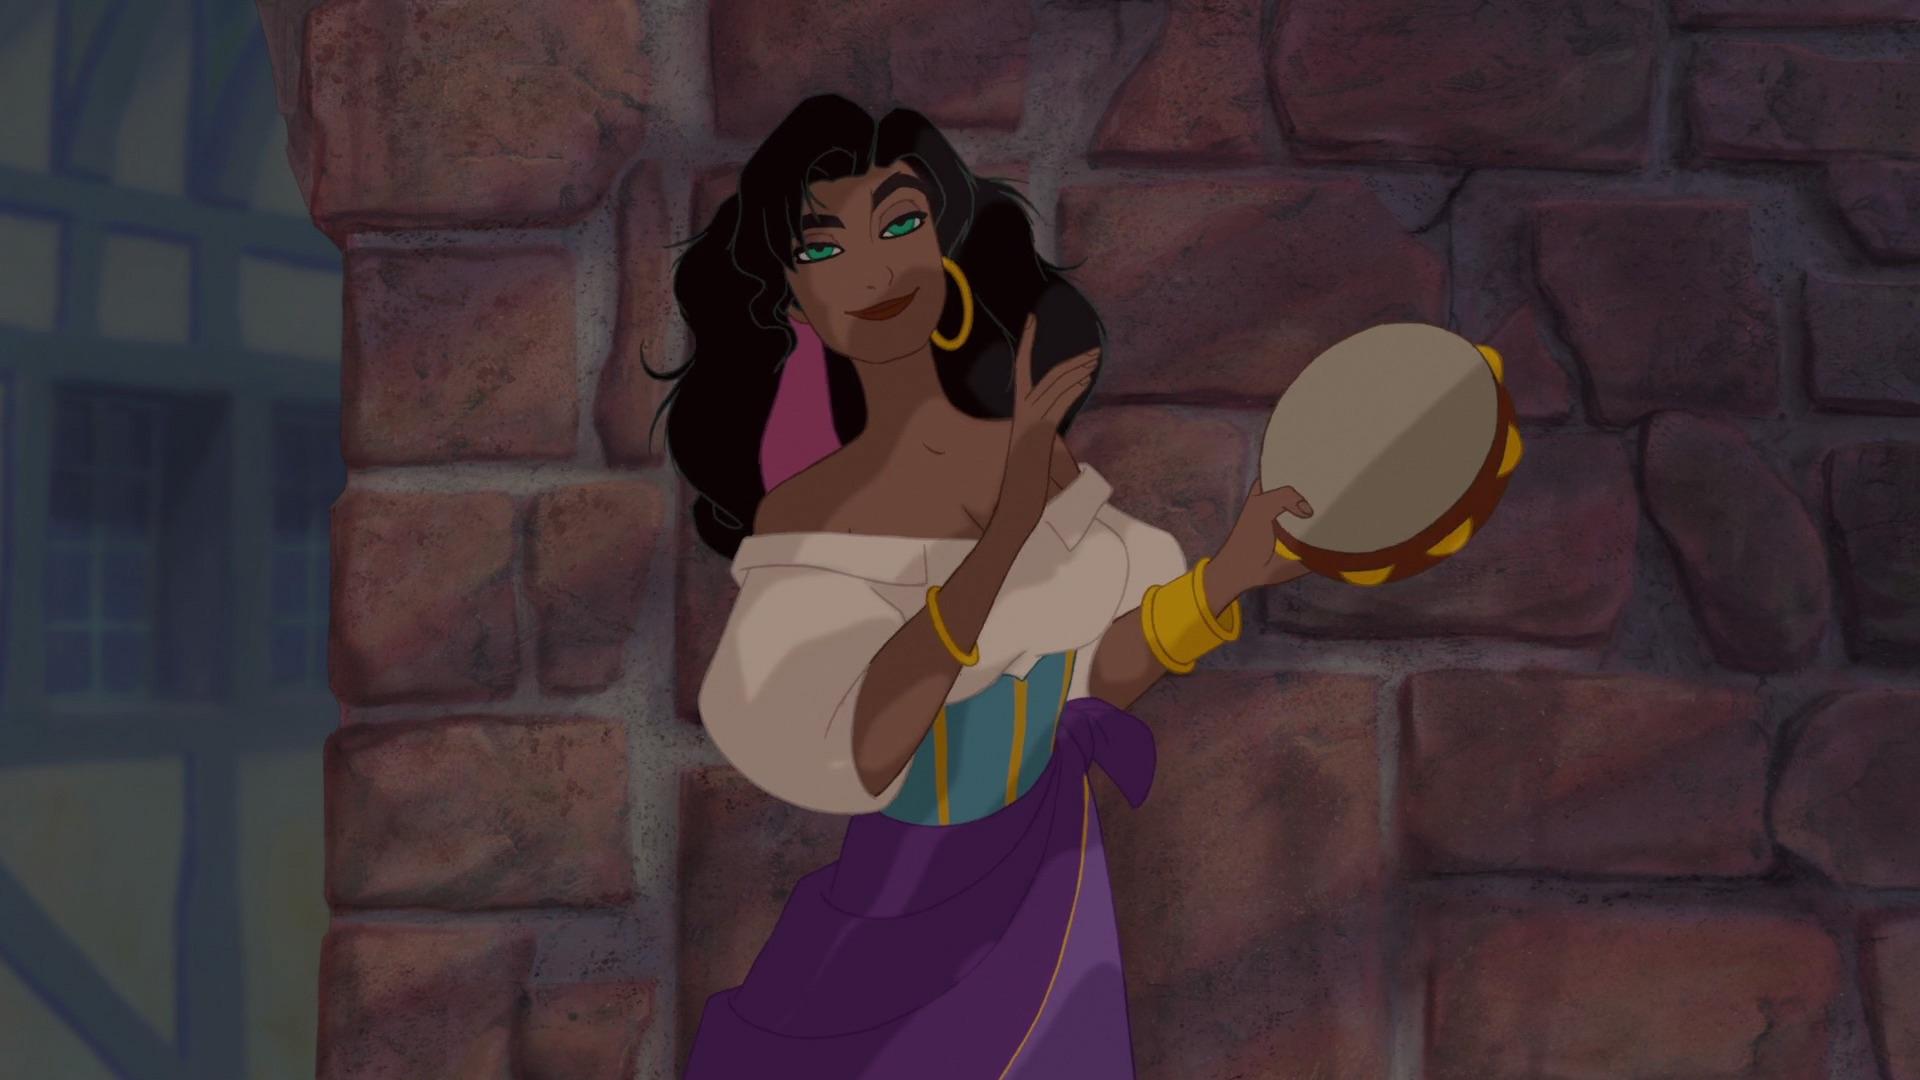 Princess esmeralda coloring pages - Image Esmeralda The Hunchback Of Notre Dame 1 Jpg Disney Wiki Fandom Powered By Wikia